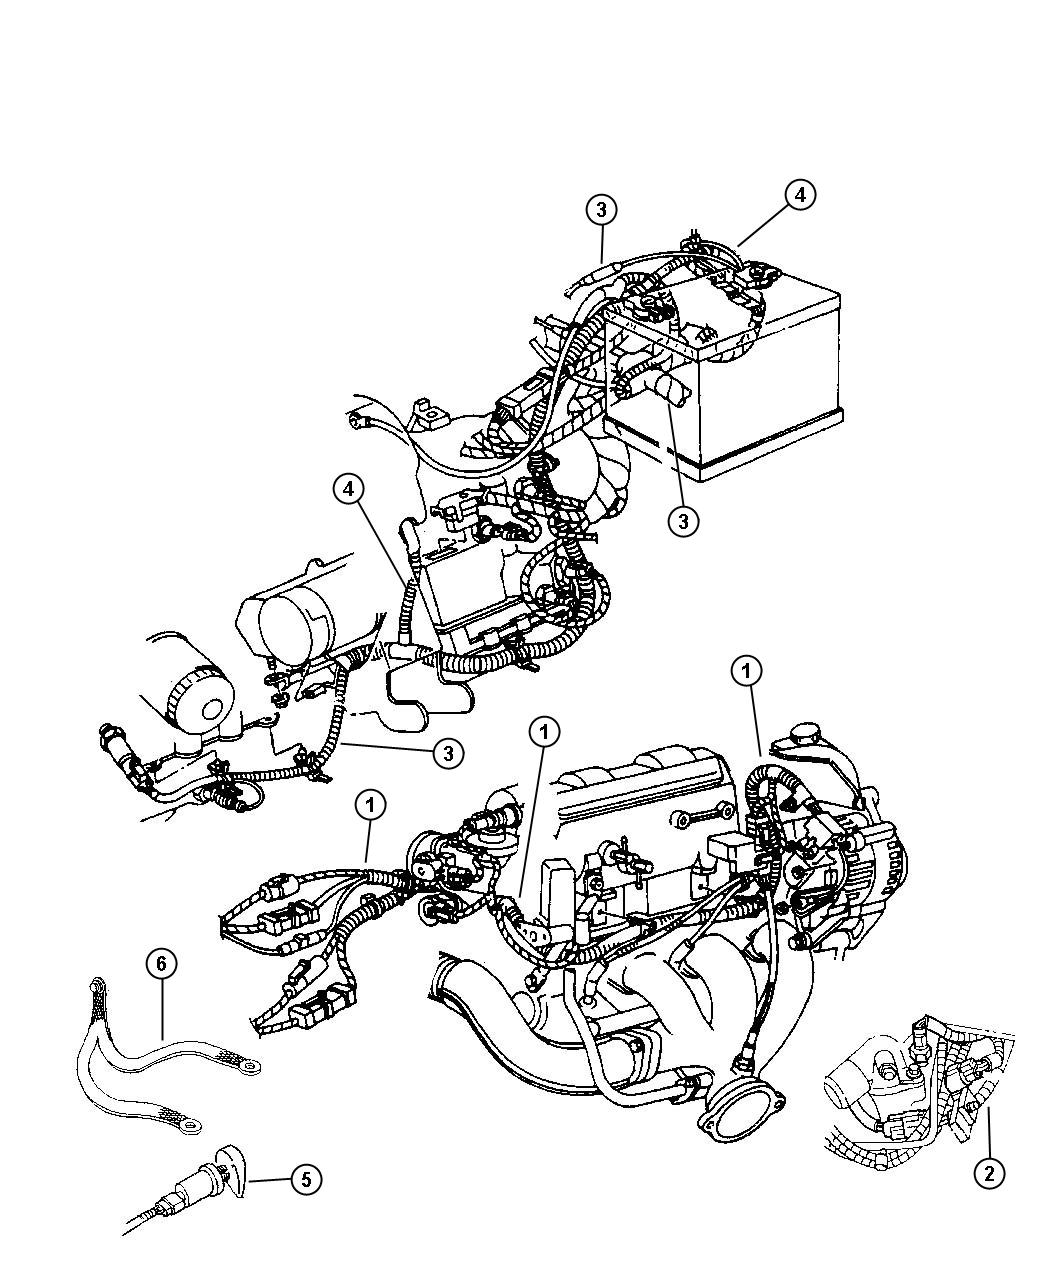 Chrysler 2 7 Engine Diagram Great Design Of Wiring 2001 Dodge Intrepid Oil Sending Unit 2002 Voyager Concorde